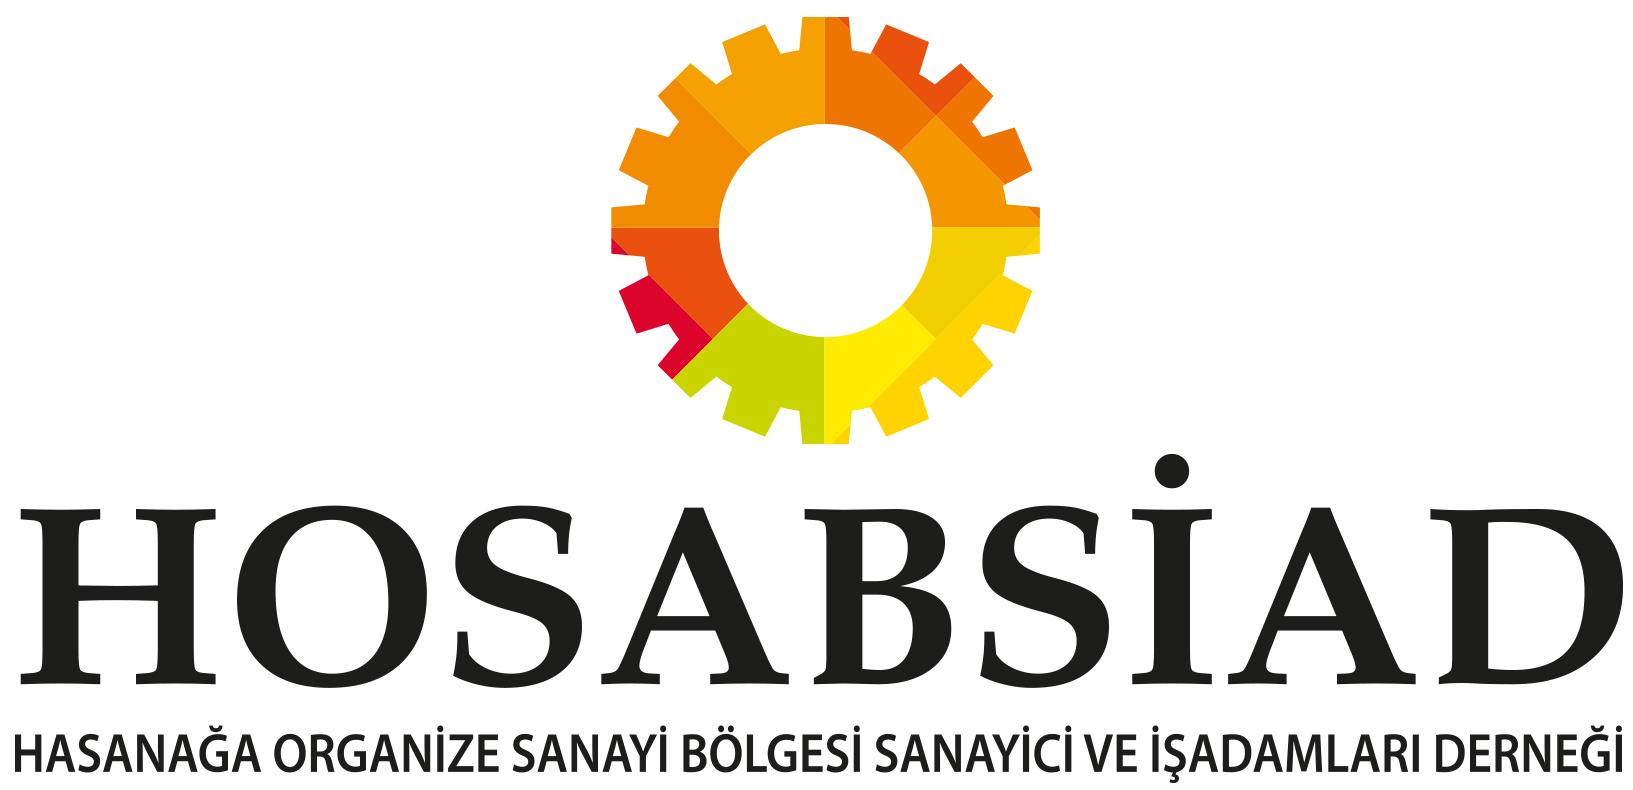 hosabsiad logo